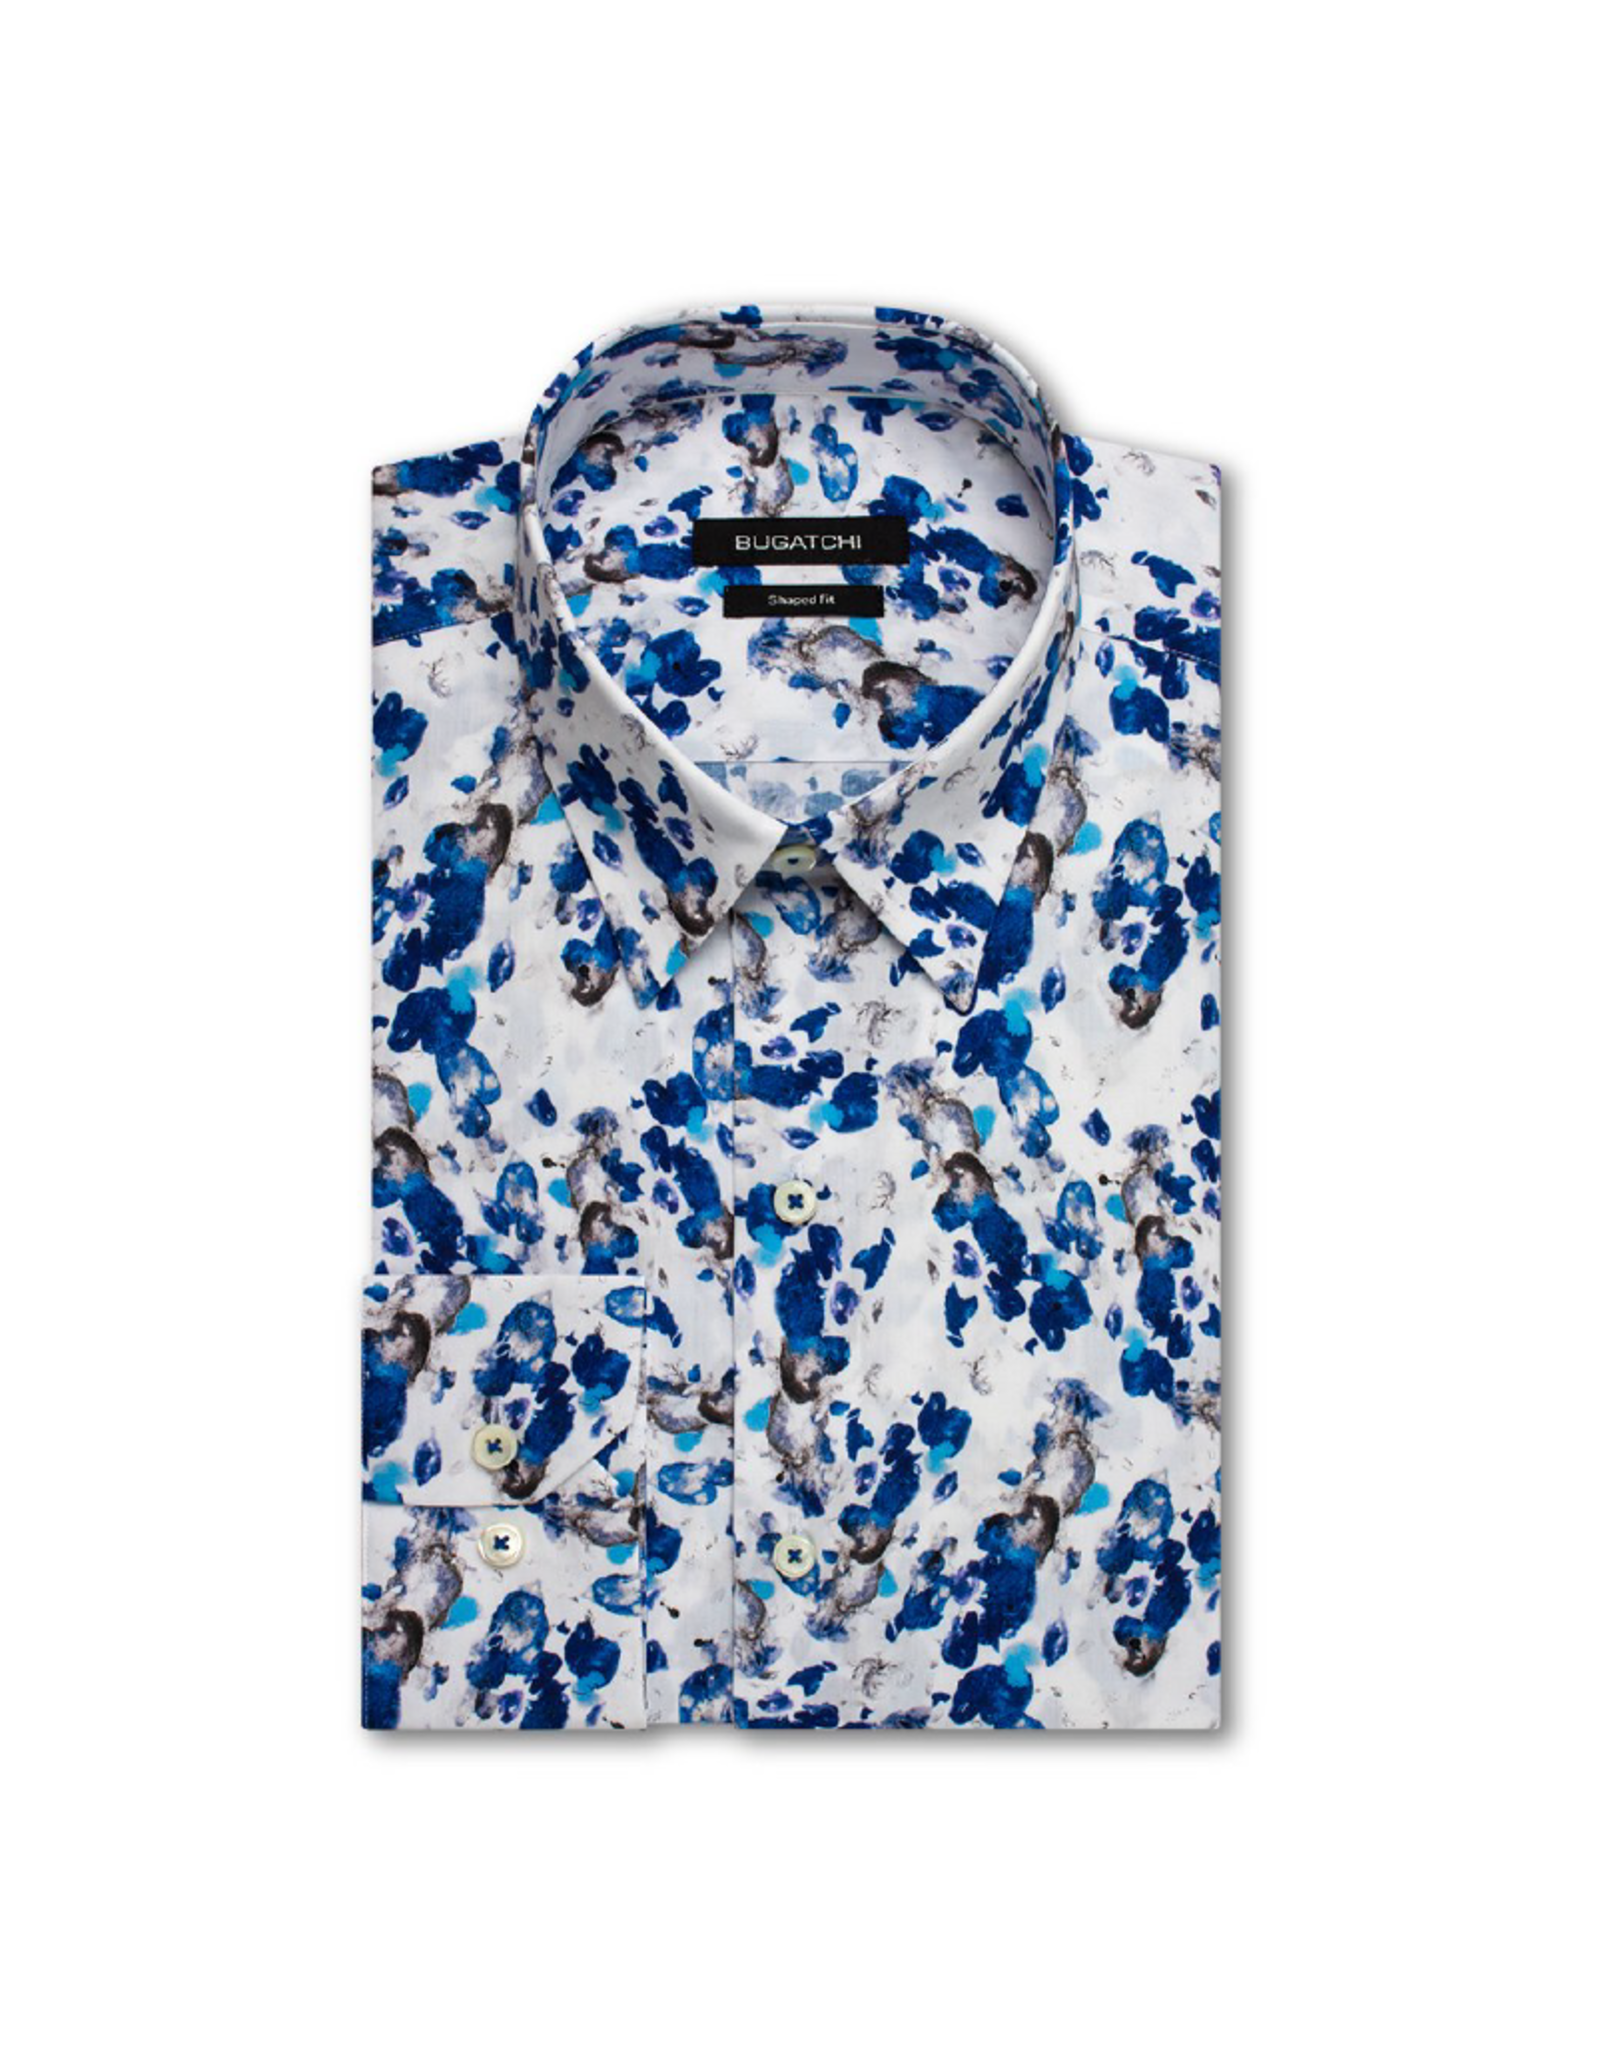 Bugatchi Uomo Abstract Button-Up Shirt